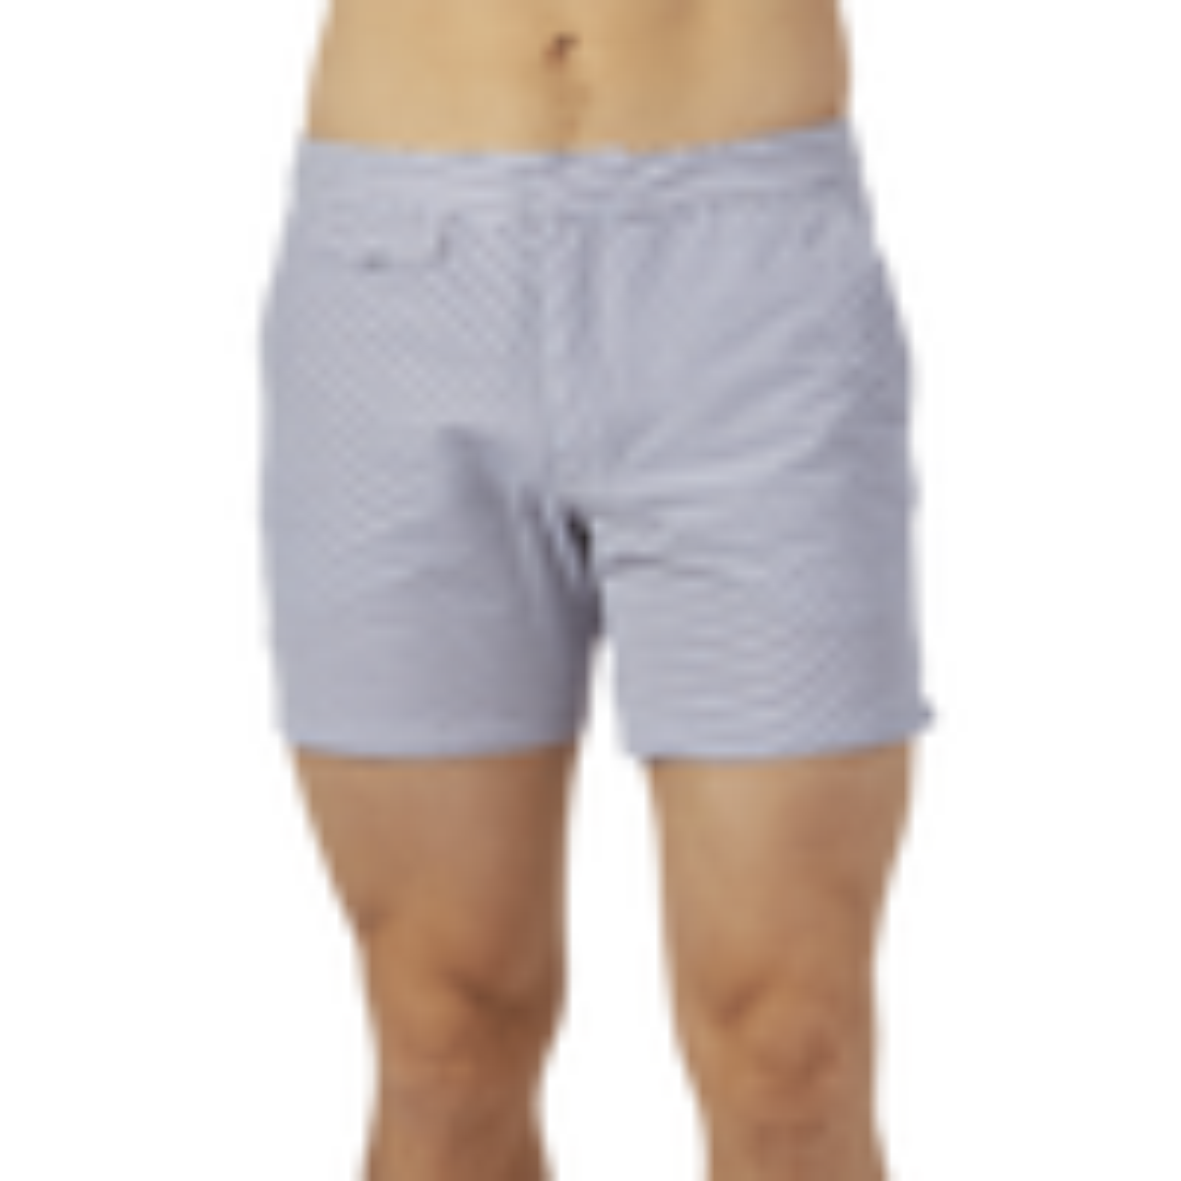 Sunspel White Grey Striped Swim Shorts Front